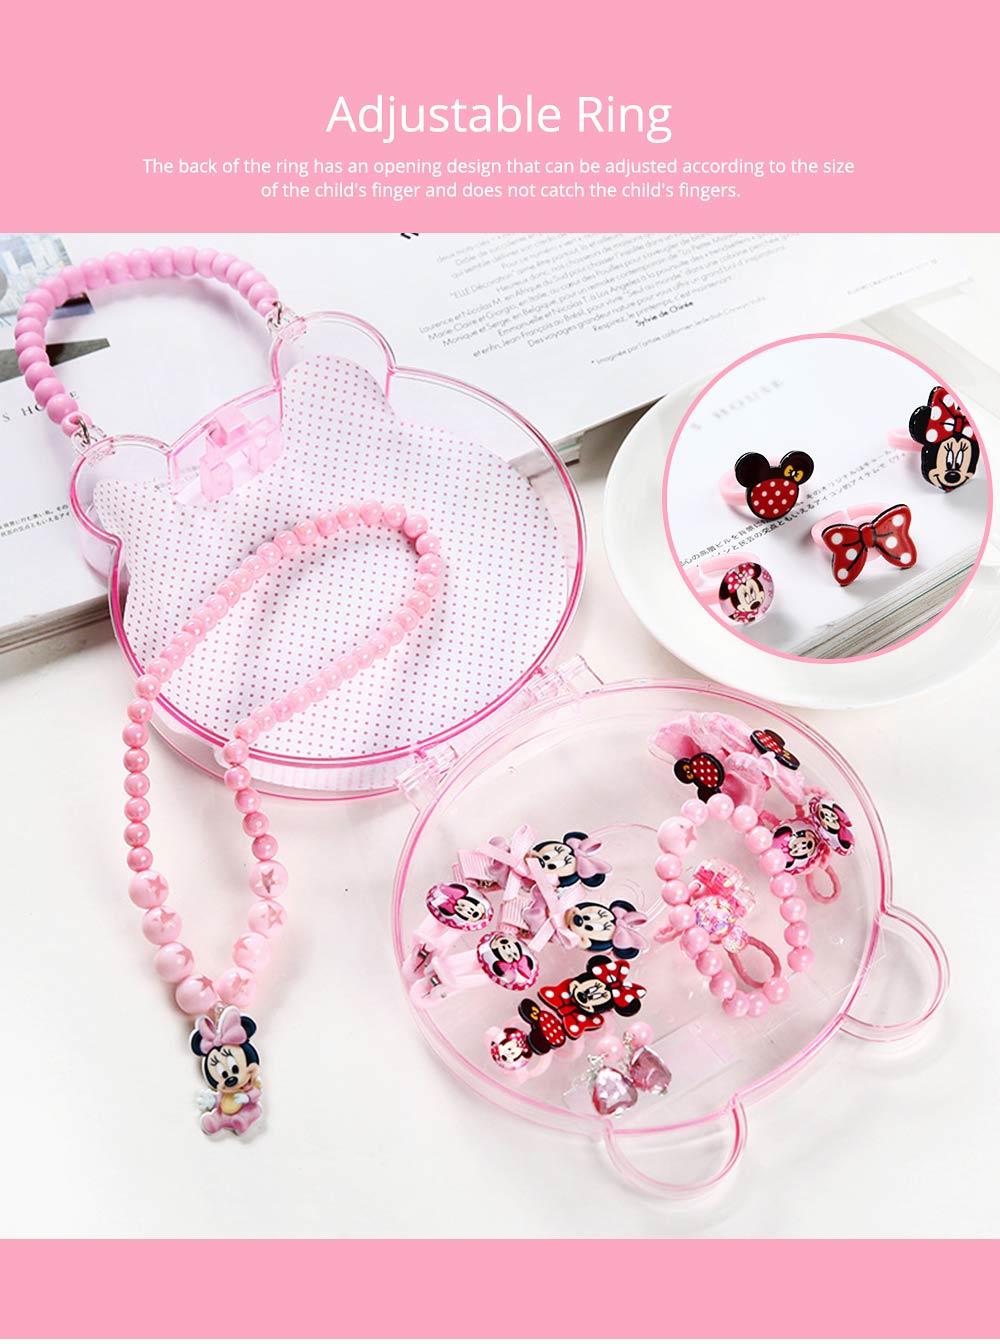 Creative Elegant Hair Accessories Necklace Bracelet Rings Suit, Cute Carton Decoration Acrylic Hand Bag Box Present for Girls 9